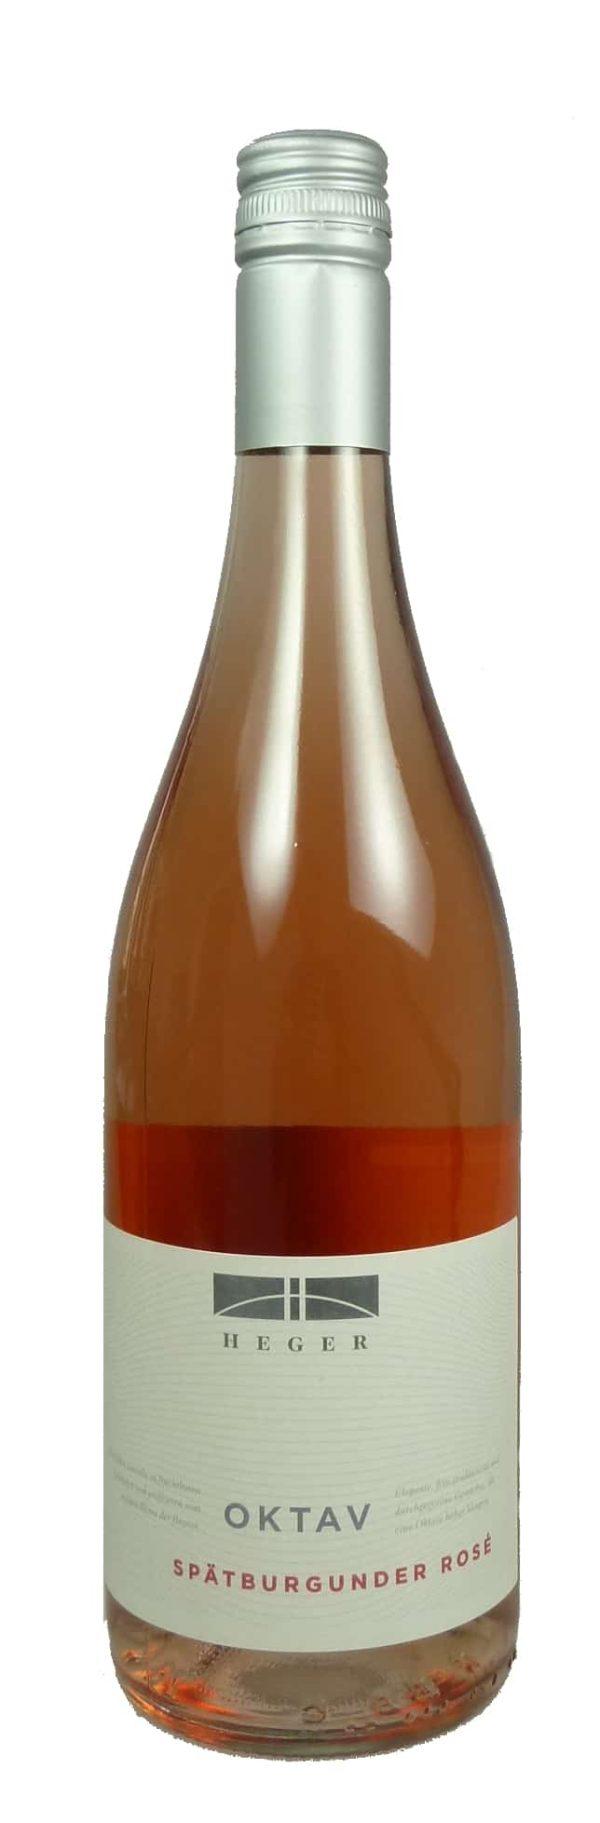 Oktav Spätburgunder Rosé Qualitätswein trocken 2017